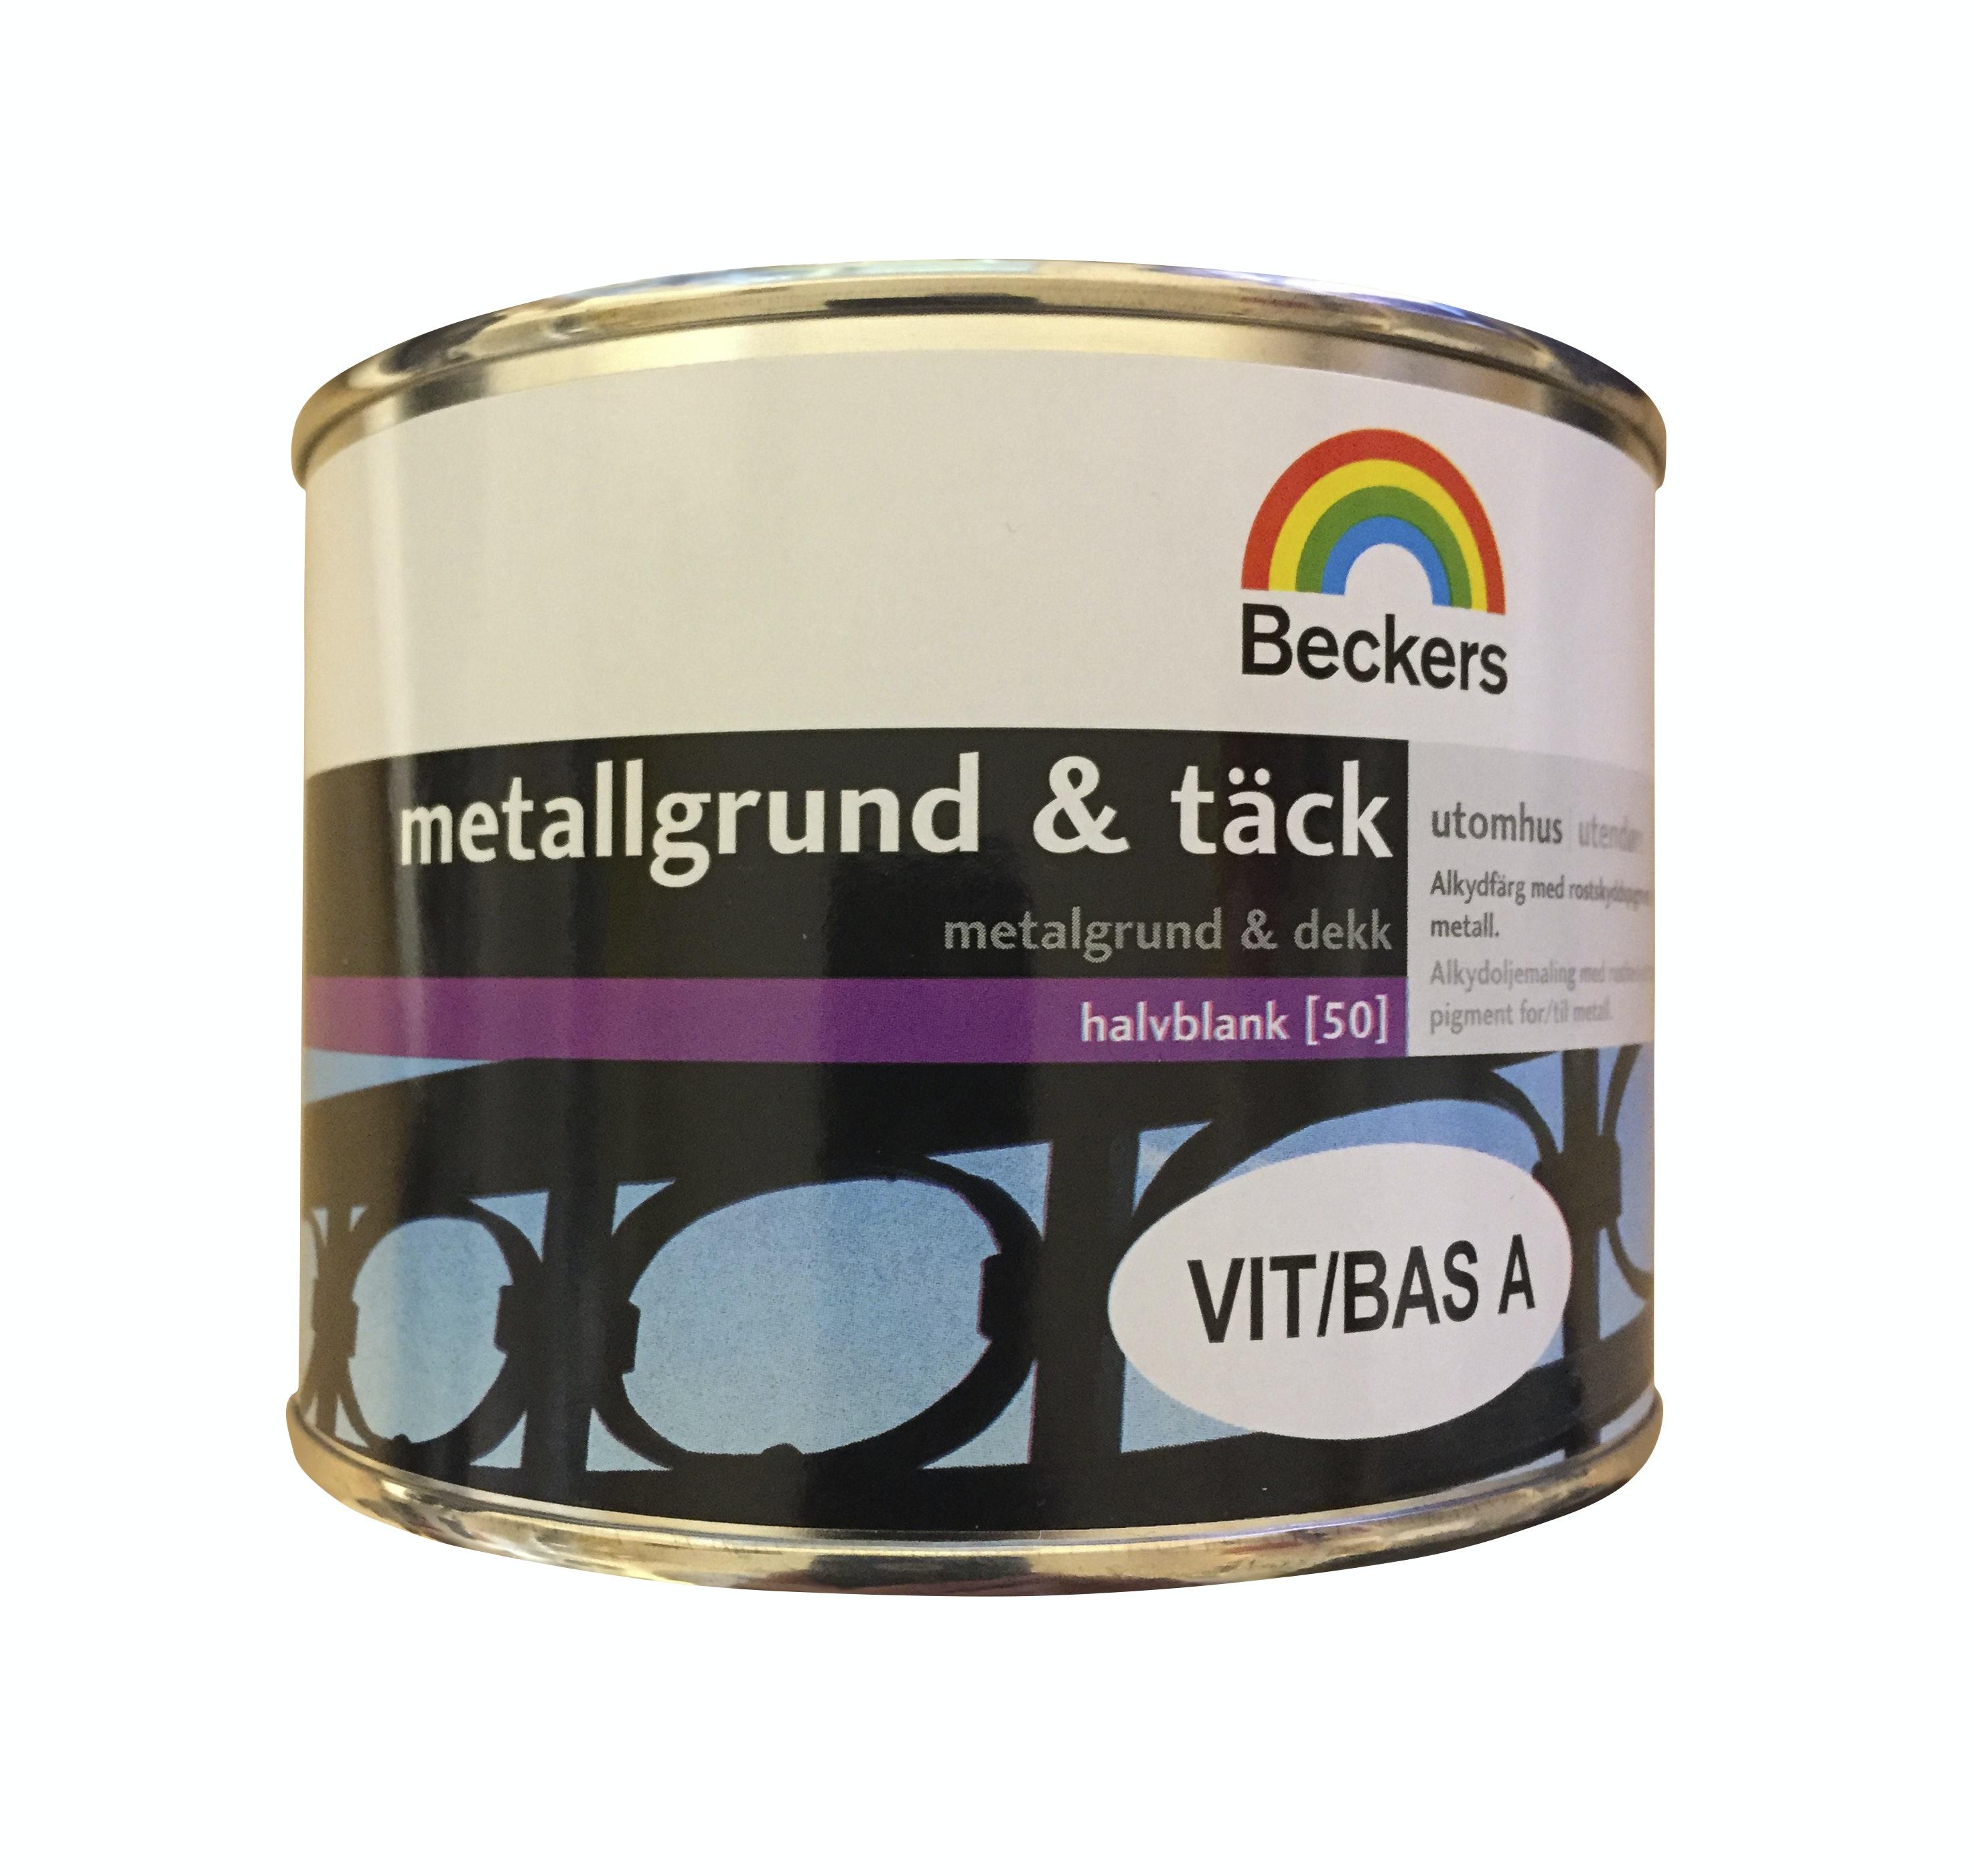 Metallgrund & Täck Beckers Halvblank Vit/Bas A 0,45L